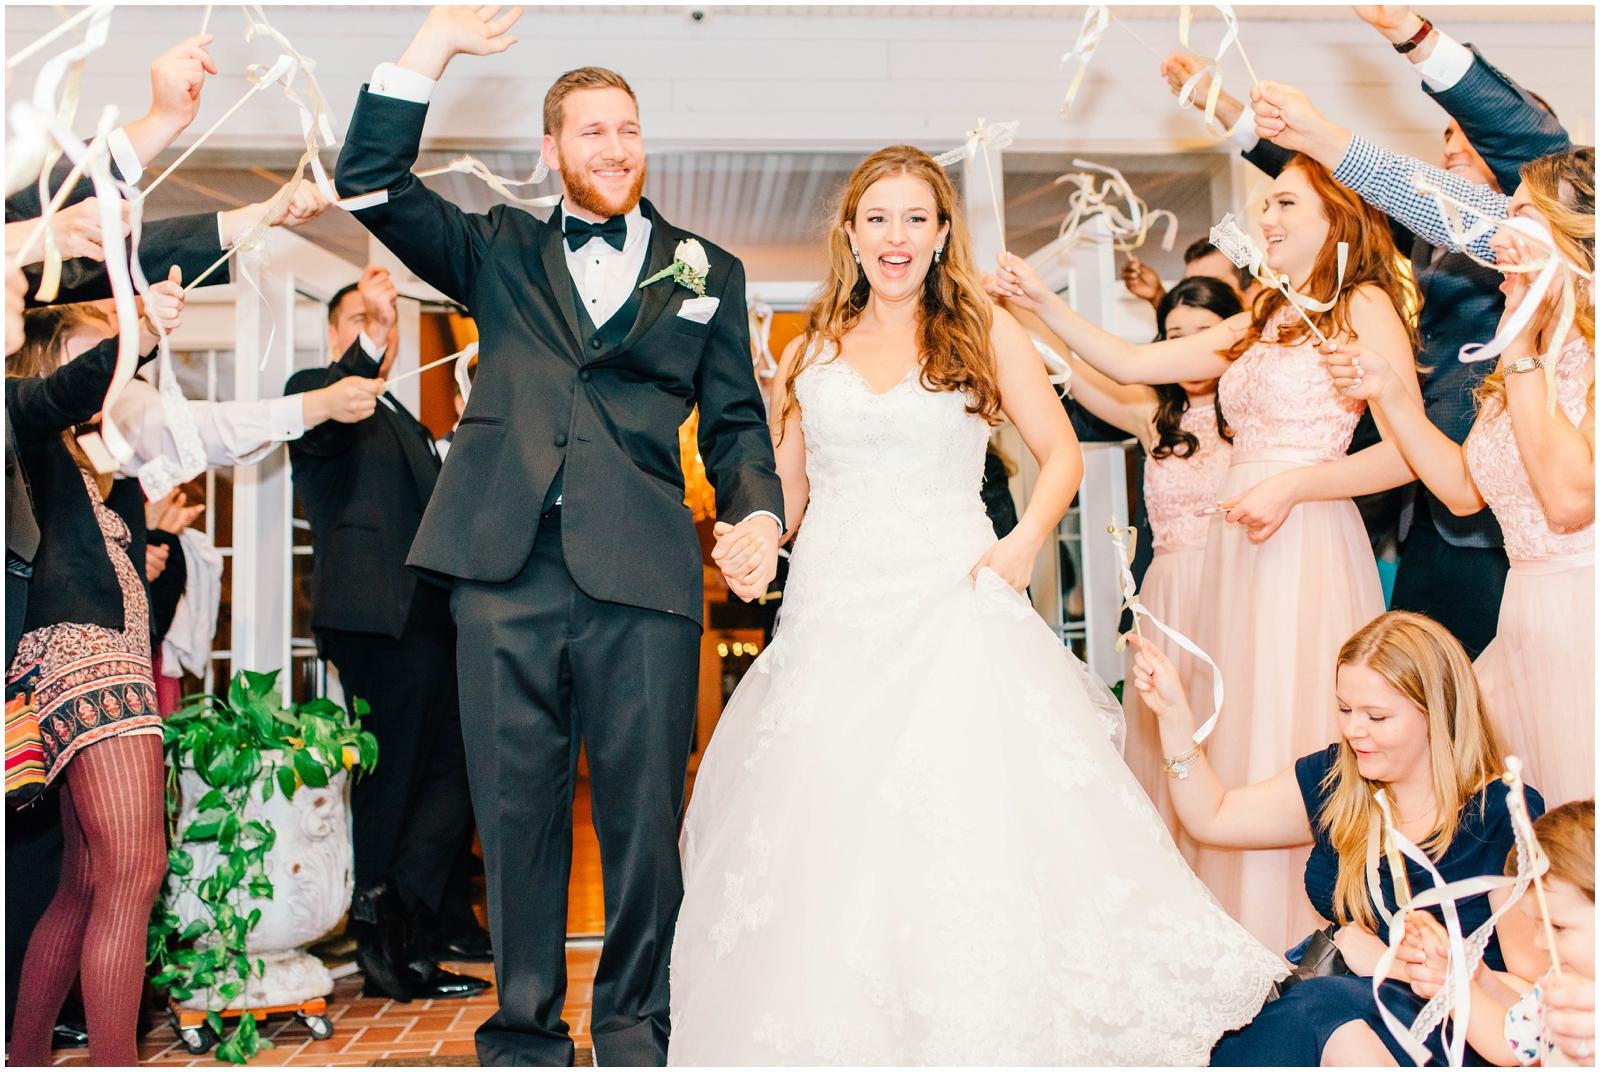 Tampa Area Wedding Venue with Southern Charm- Stonebridge Events_0291.jpg